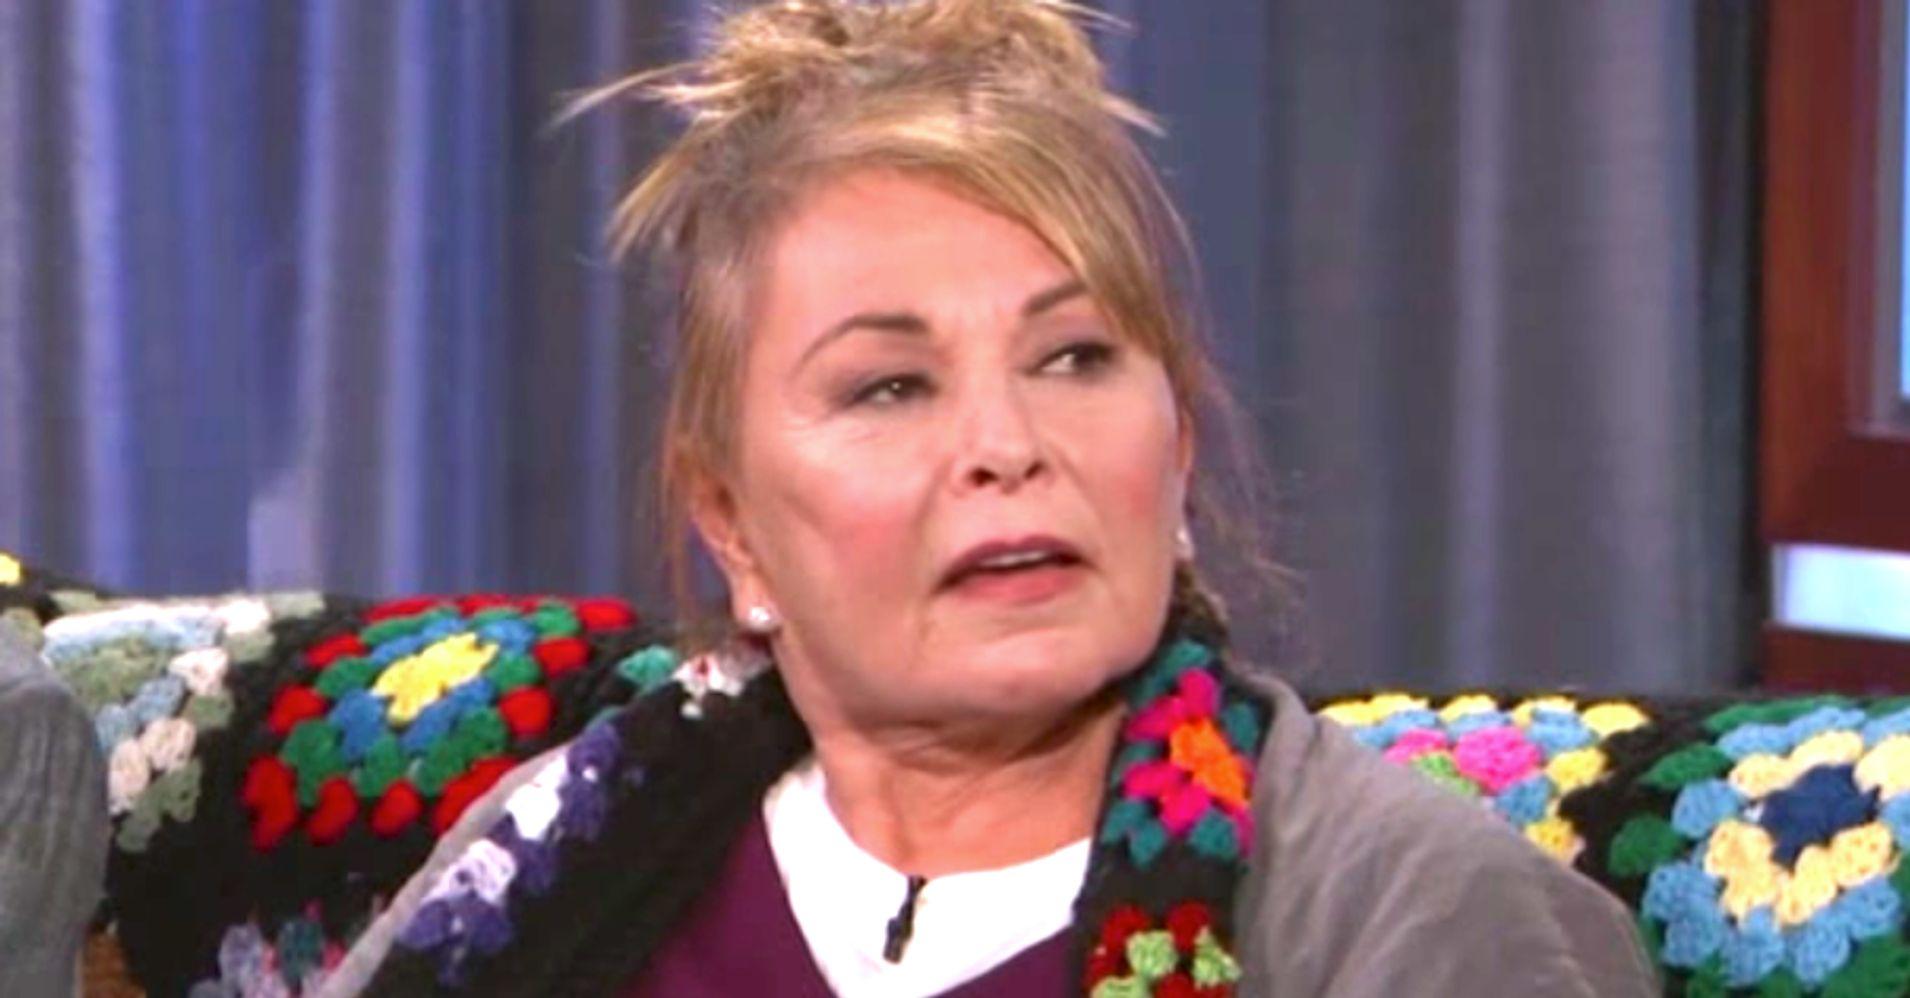 Roseanne Barr Tells Jimmy Kimmel To 'Zip That F**king Lip' About Trump